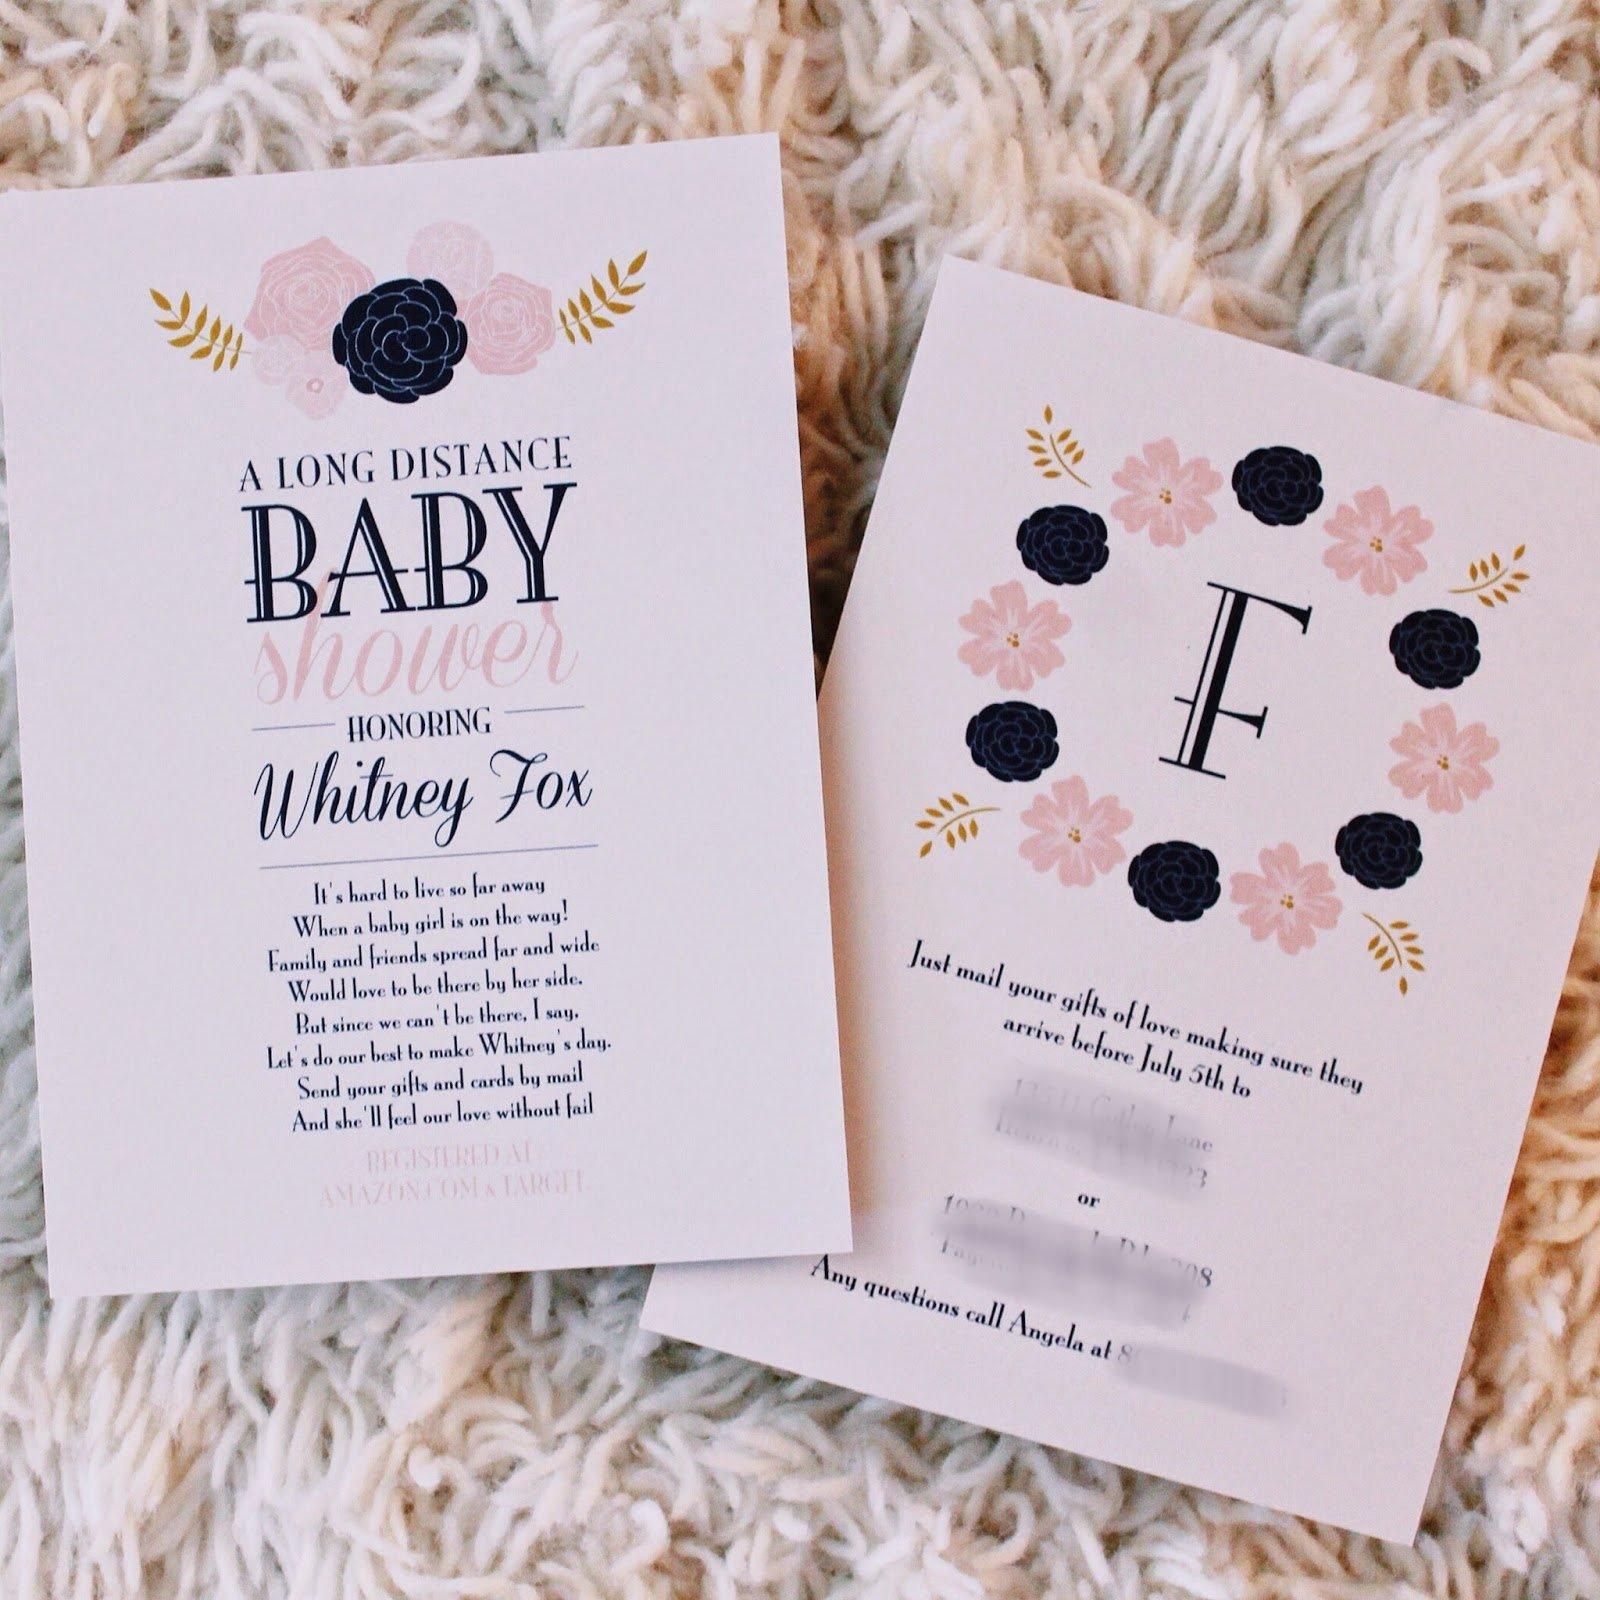 10 Cute Long Distance Baby Shower Ideas virtual baby shower invitations e280a2 baby showers ideas 2020